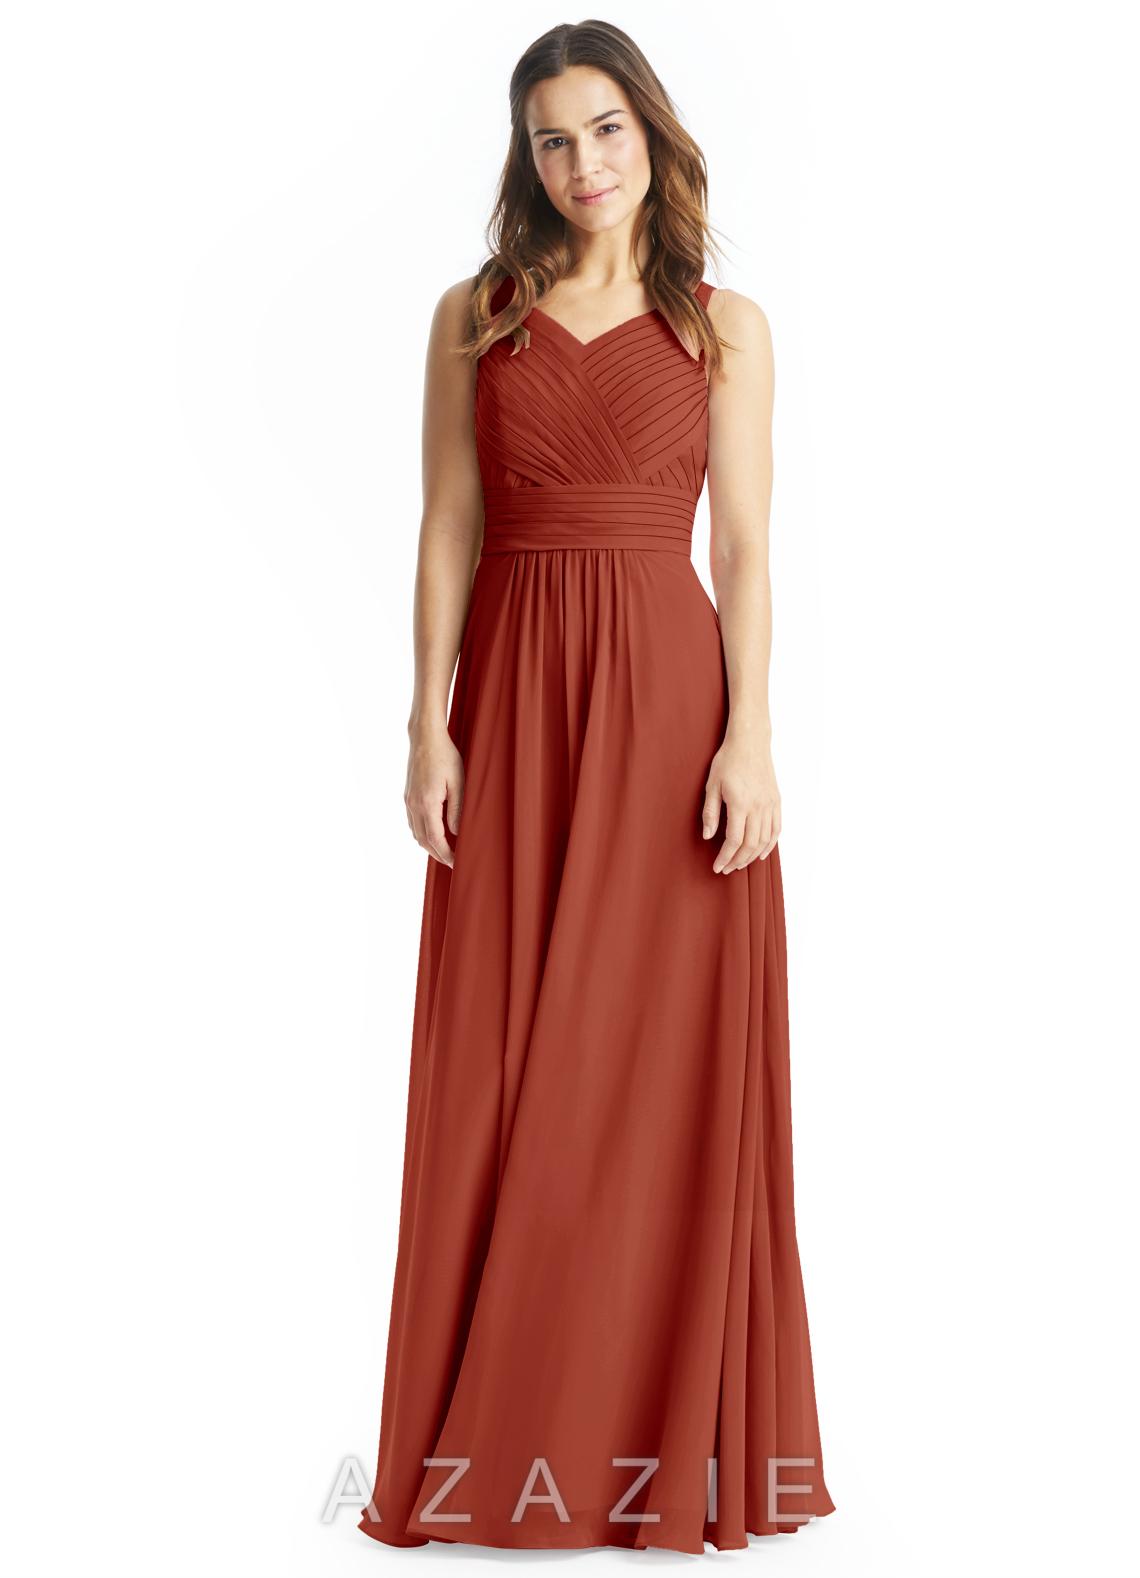 22b62202ef2 Azazie Pierrette Bridesmaid Dress - Rust